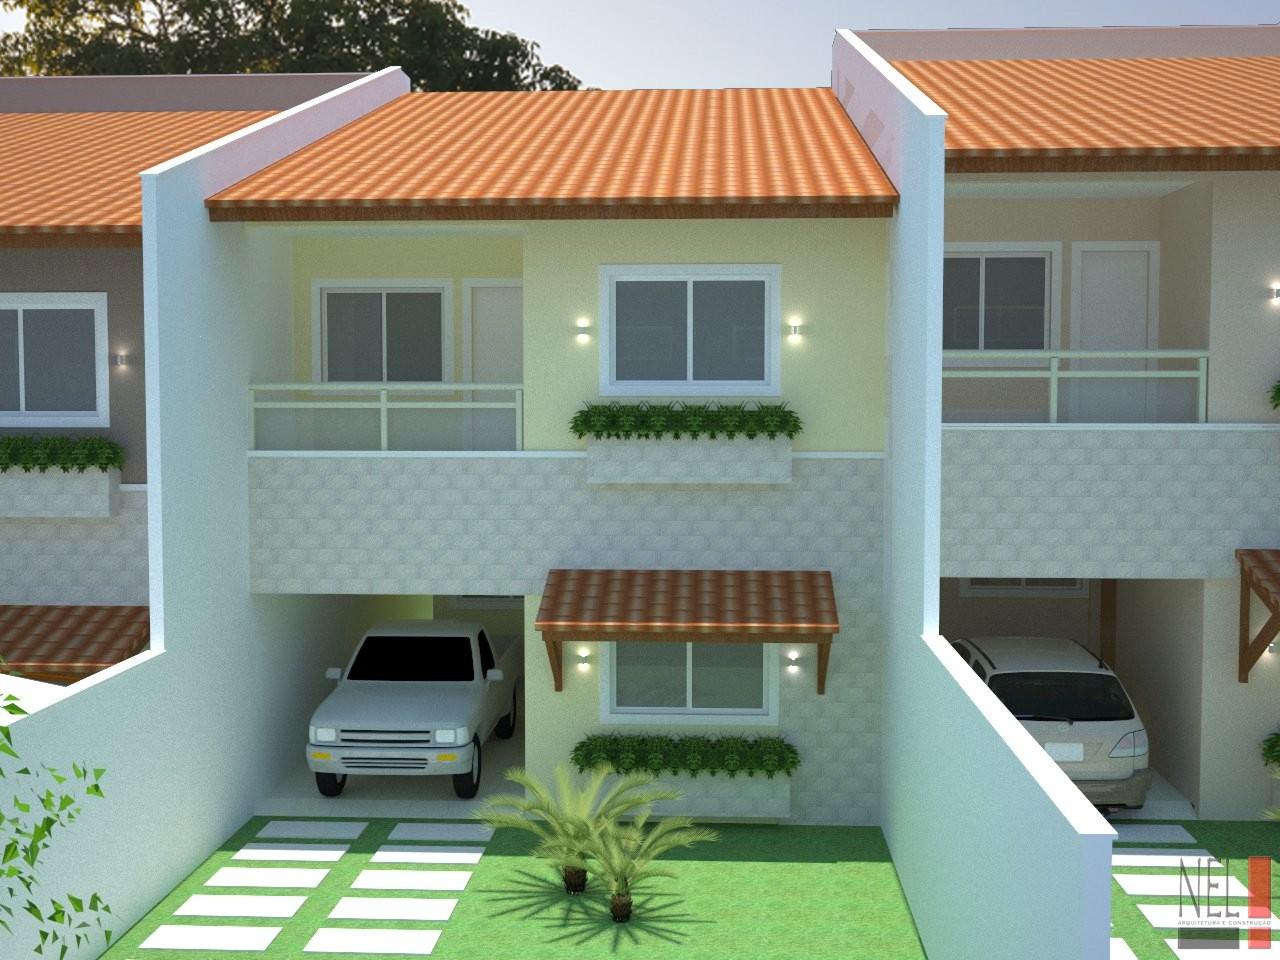 Fachadas de casas geminadas e modernas fotos decorando casas for Fachadas casas modernas